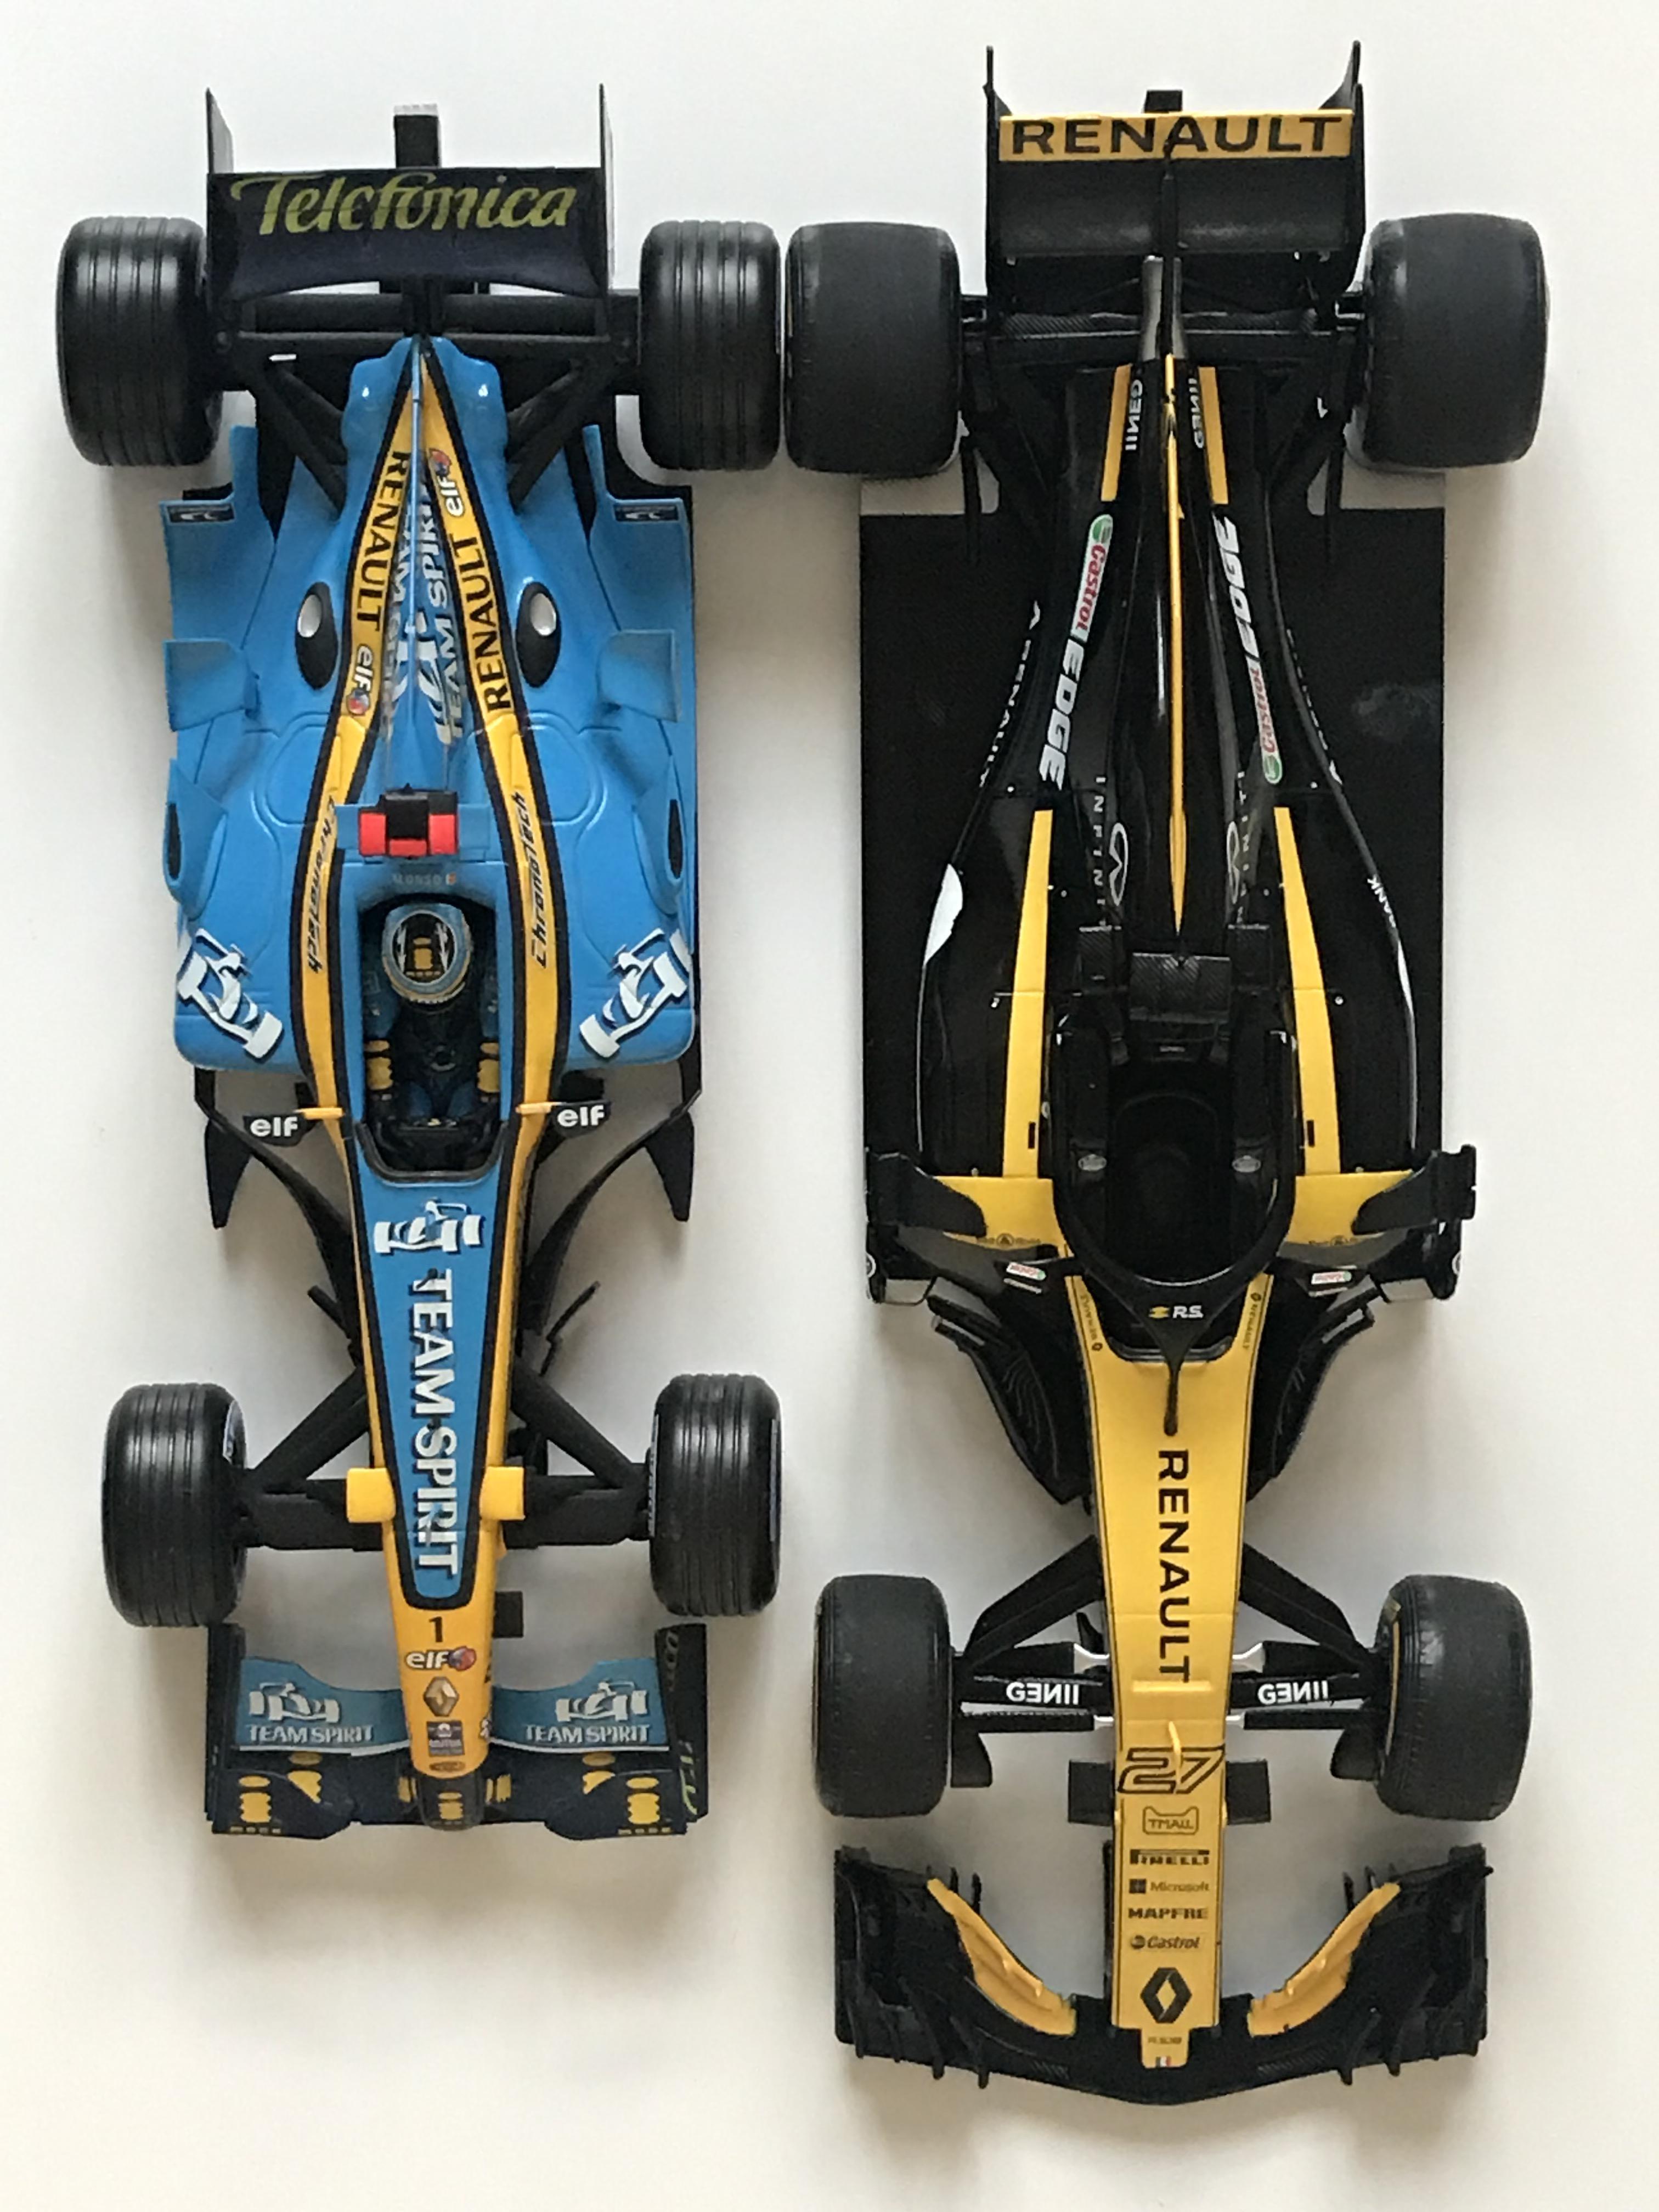 F1 Car Size Comparison : comparison, Renault, Today., Decided, Comparison., (1:18, Scale), Formula1